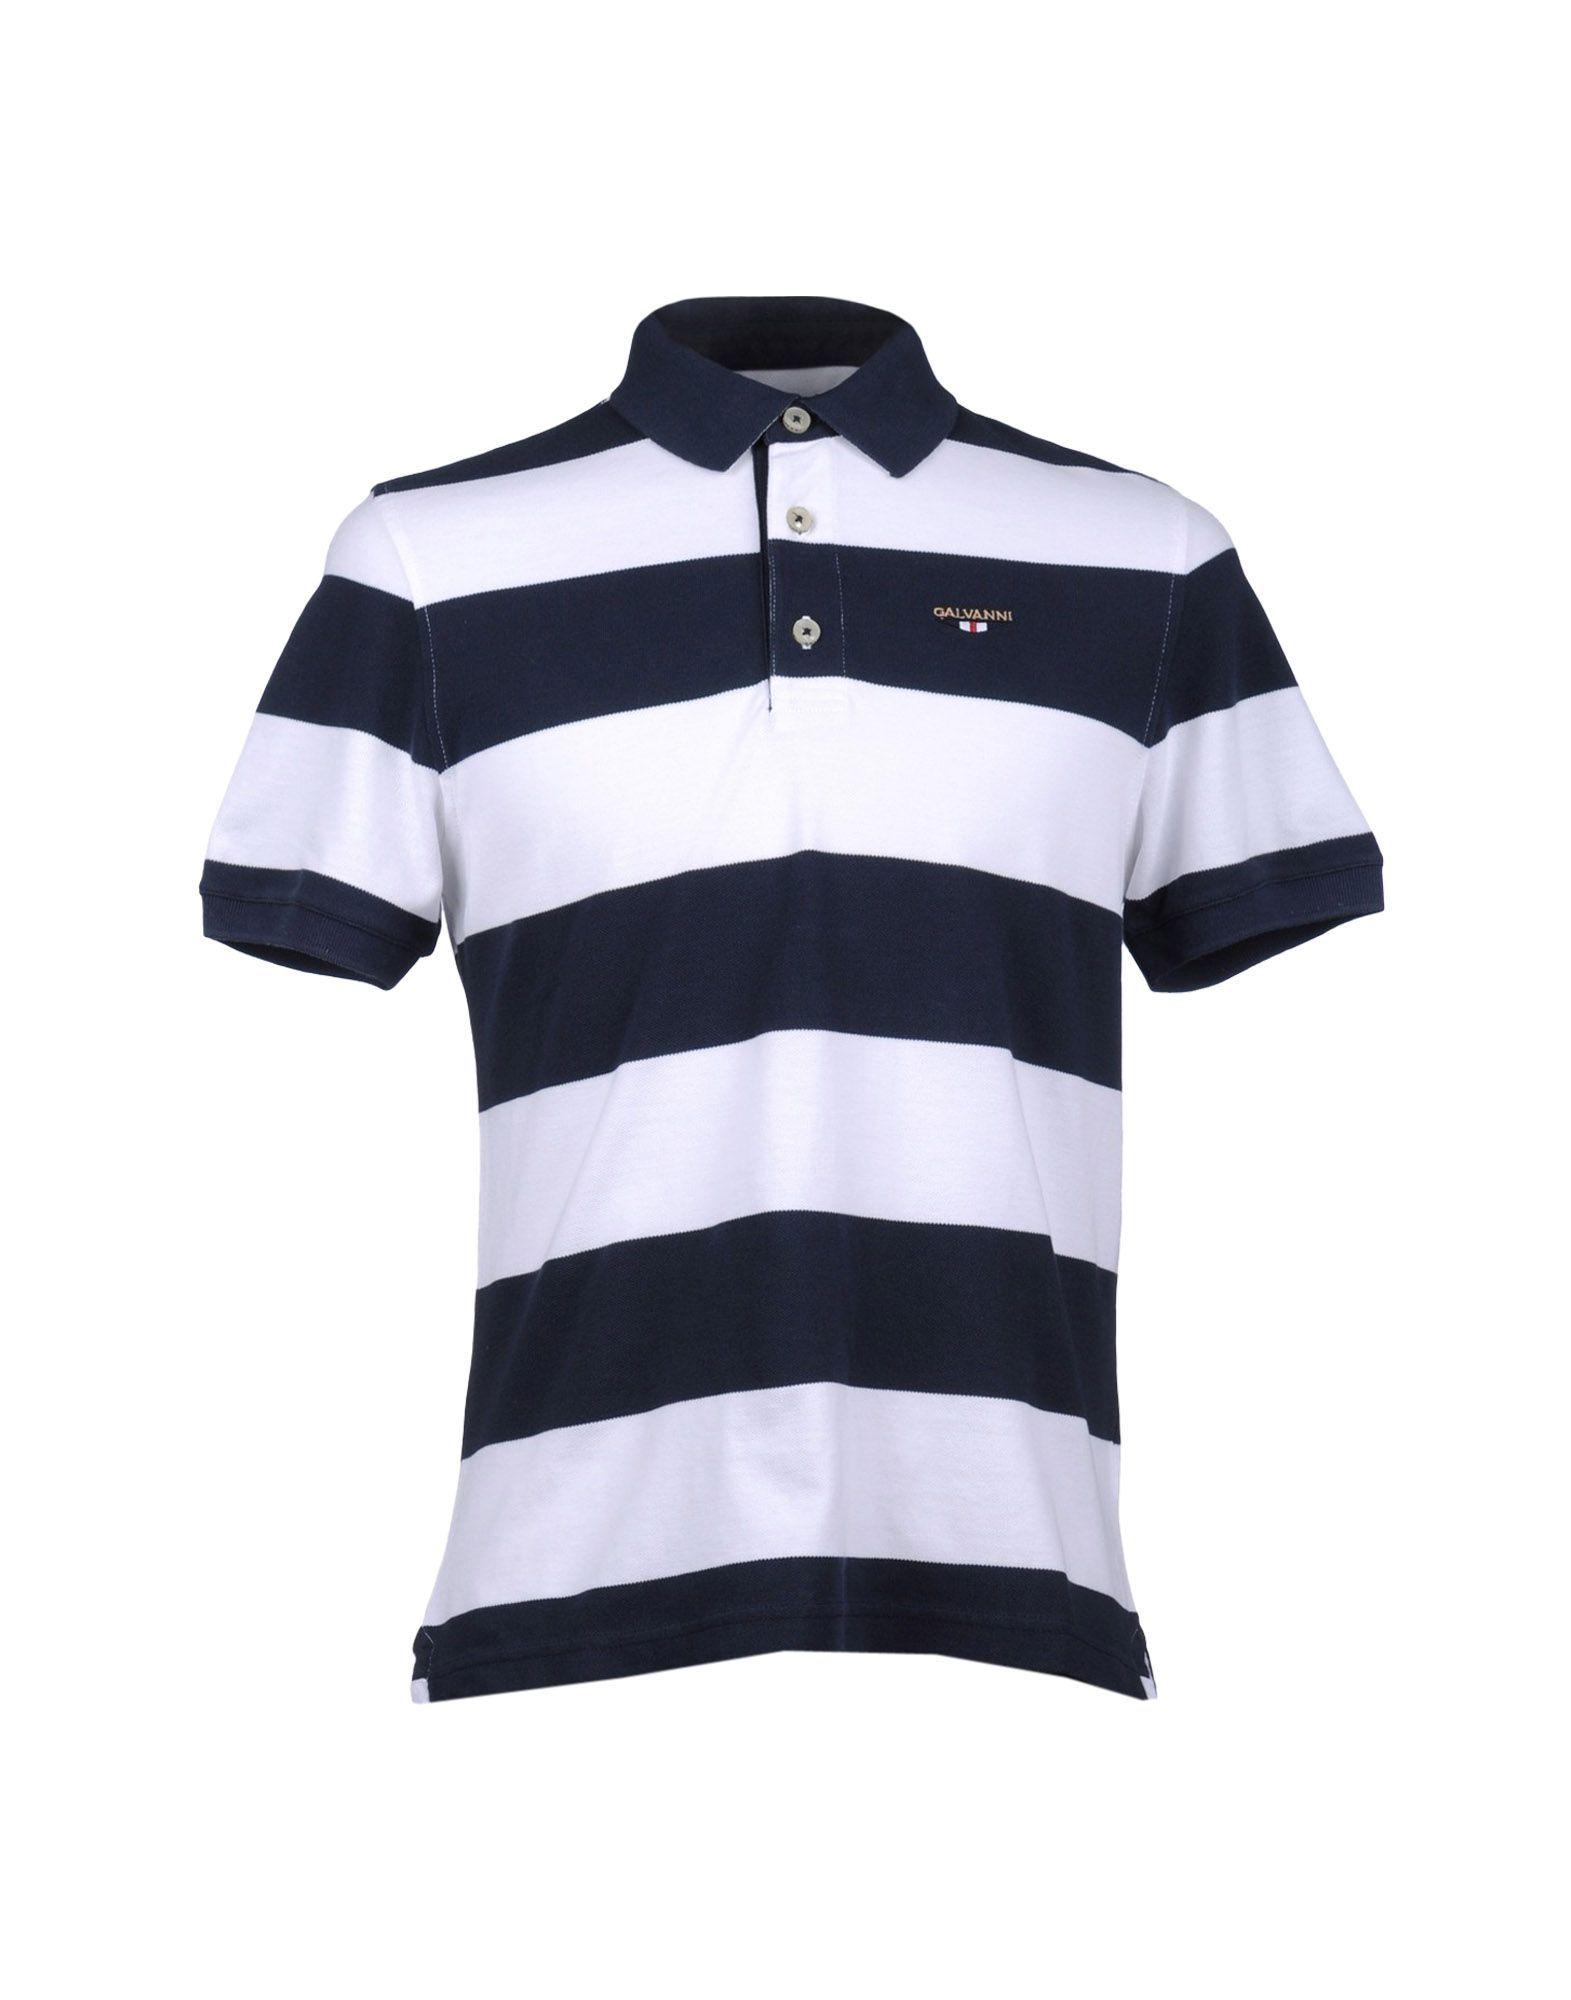 4f86bac5 Galvanni Polo Shirt - Men Galvanni Polo Shirts online on YOOX United States